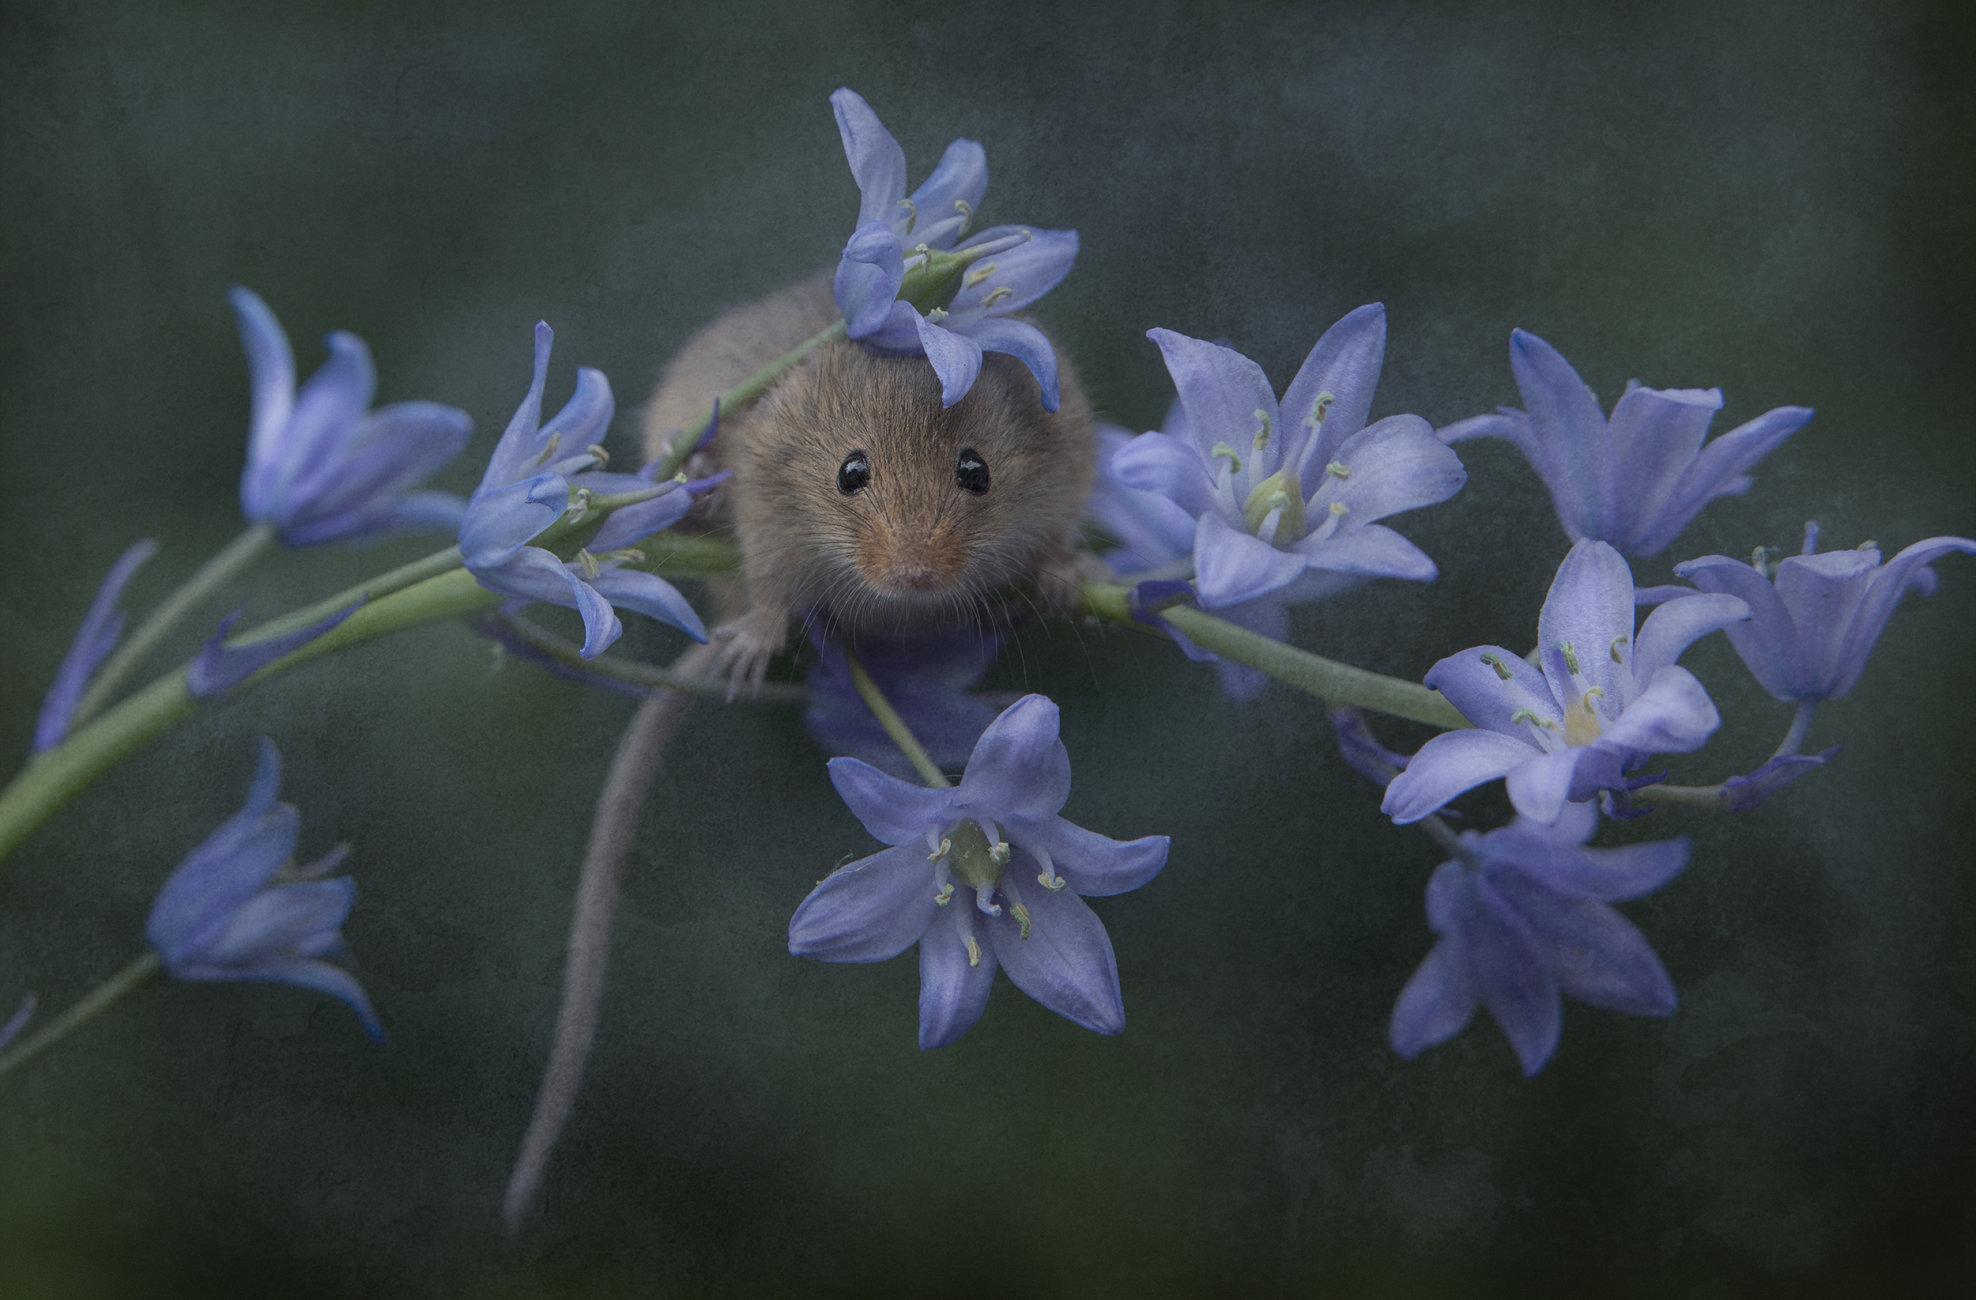 Harvest Mouse - Art?